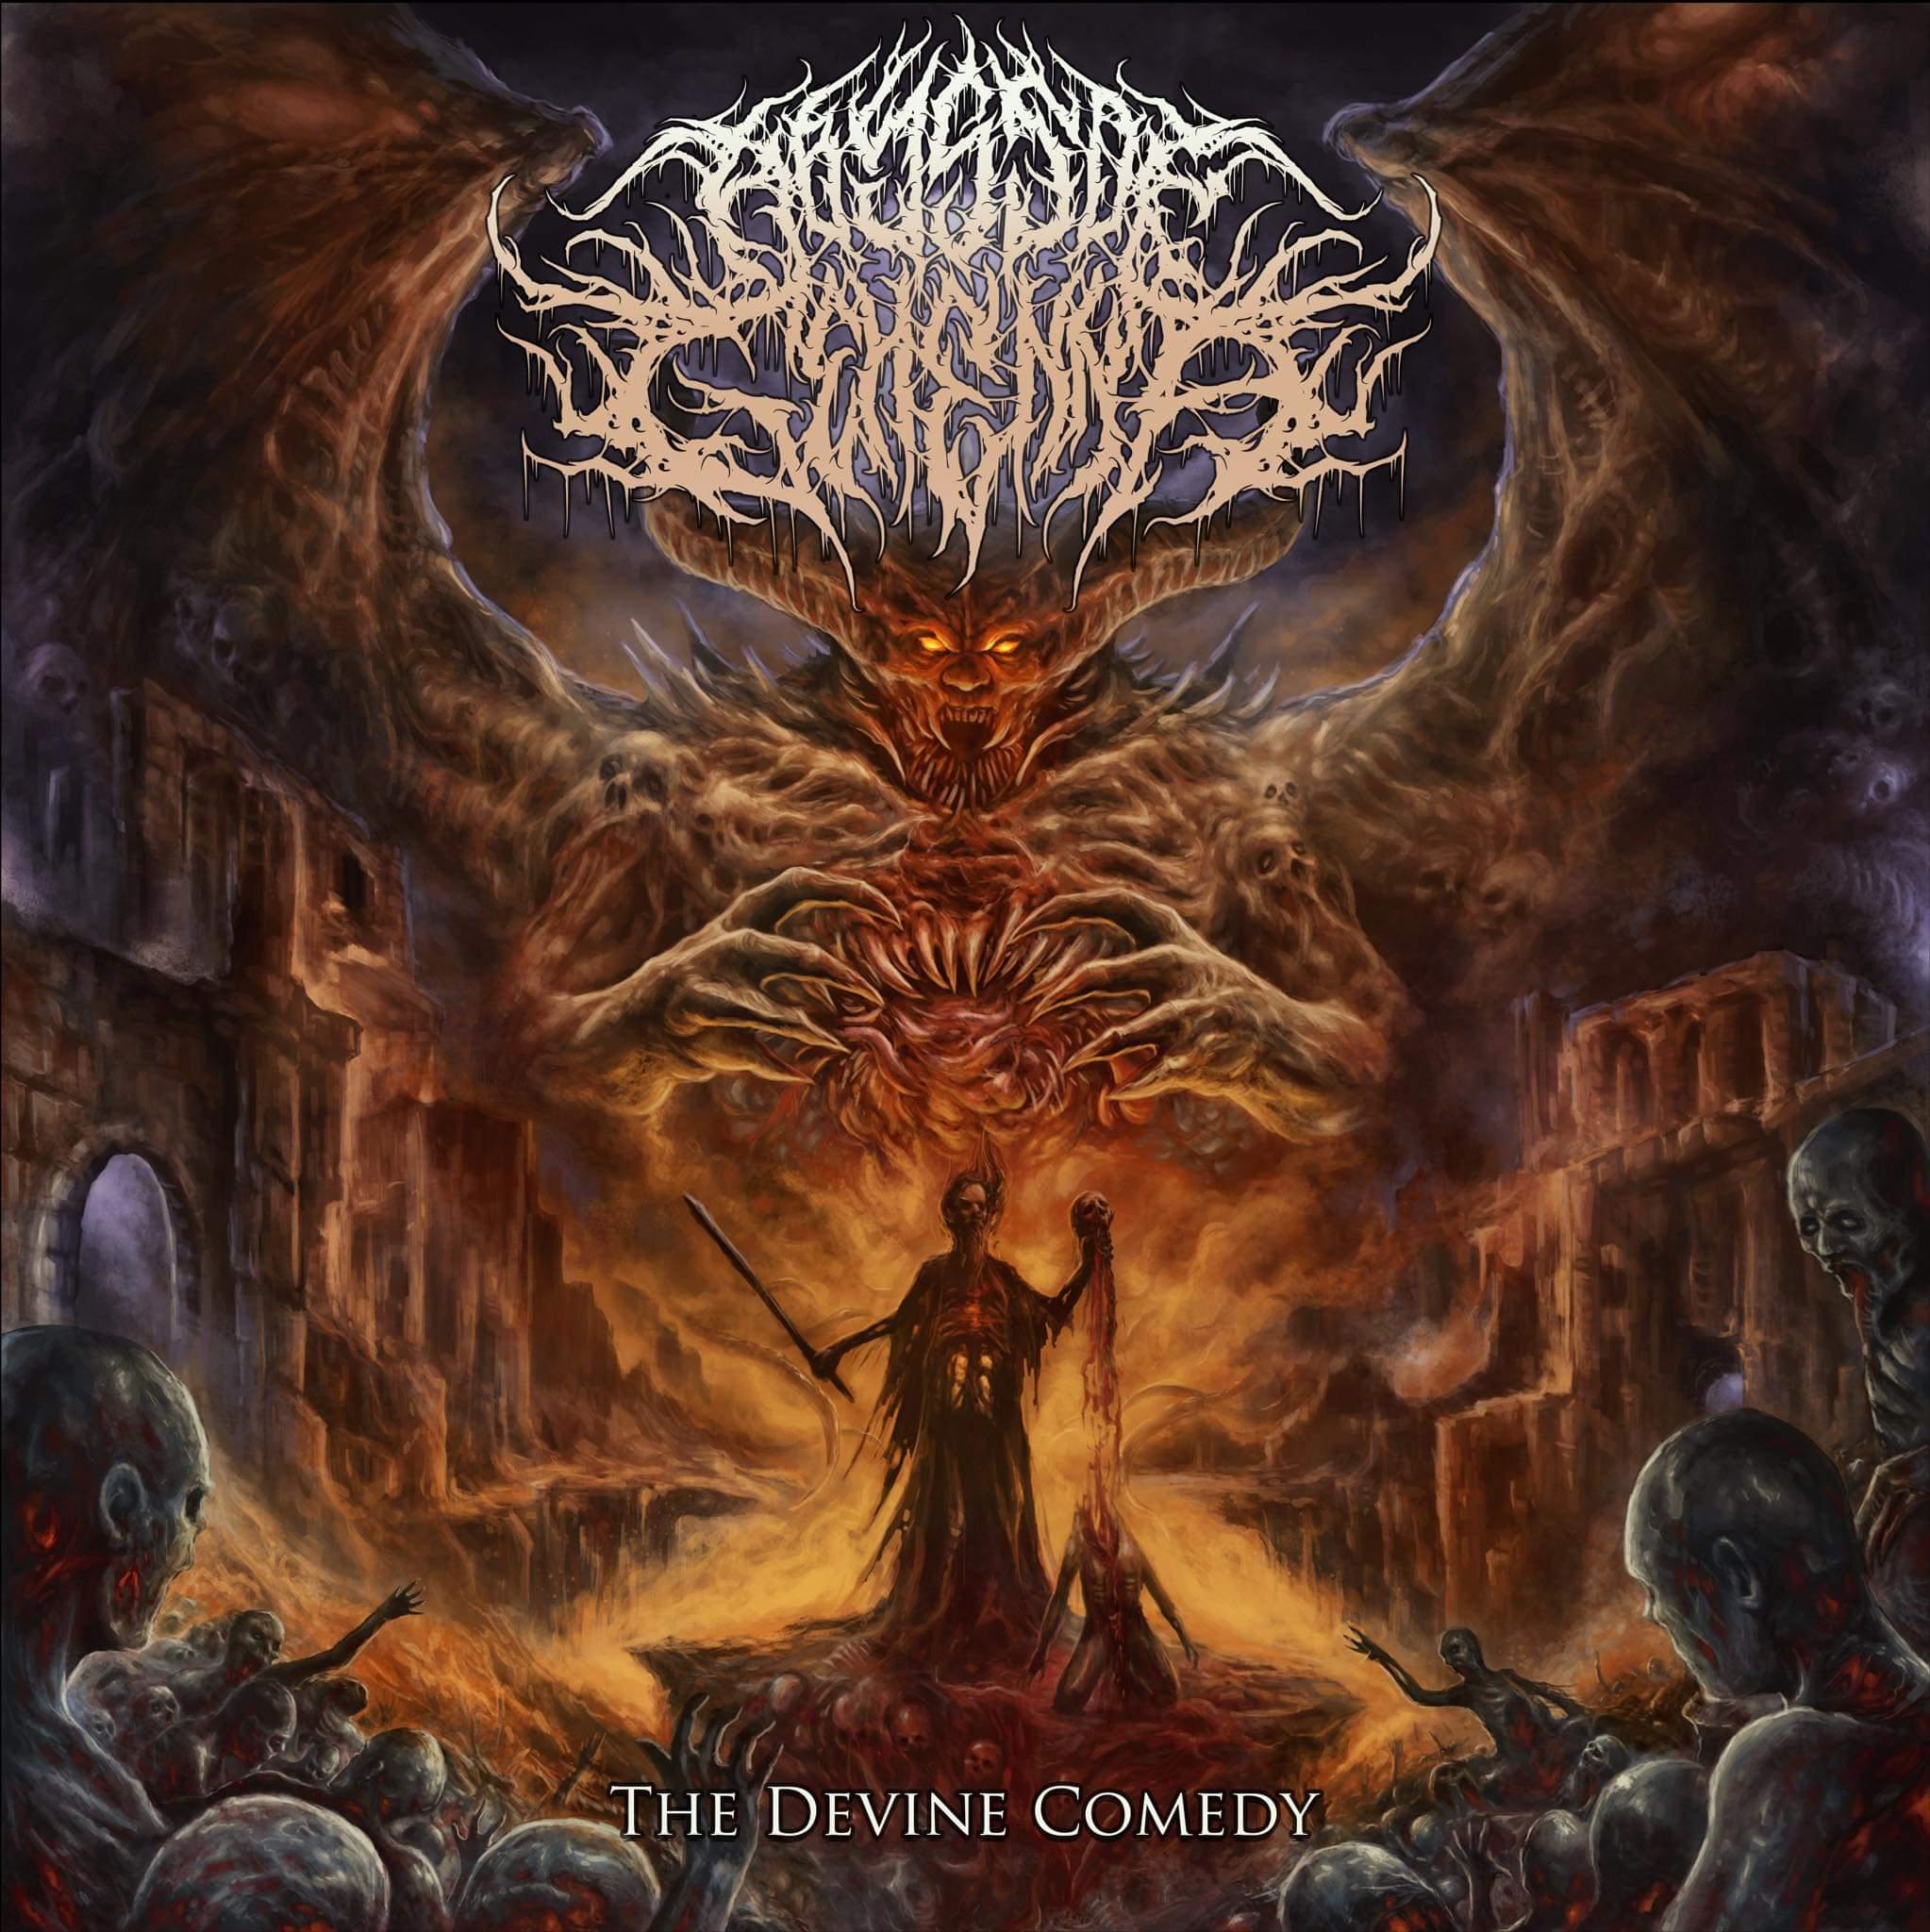 Abyss of Gehenna - Treachery [single] (2021)